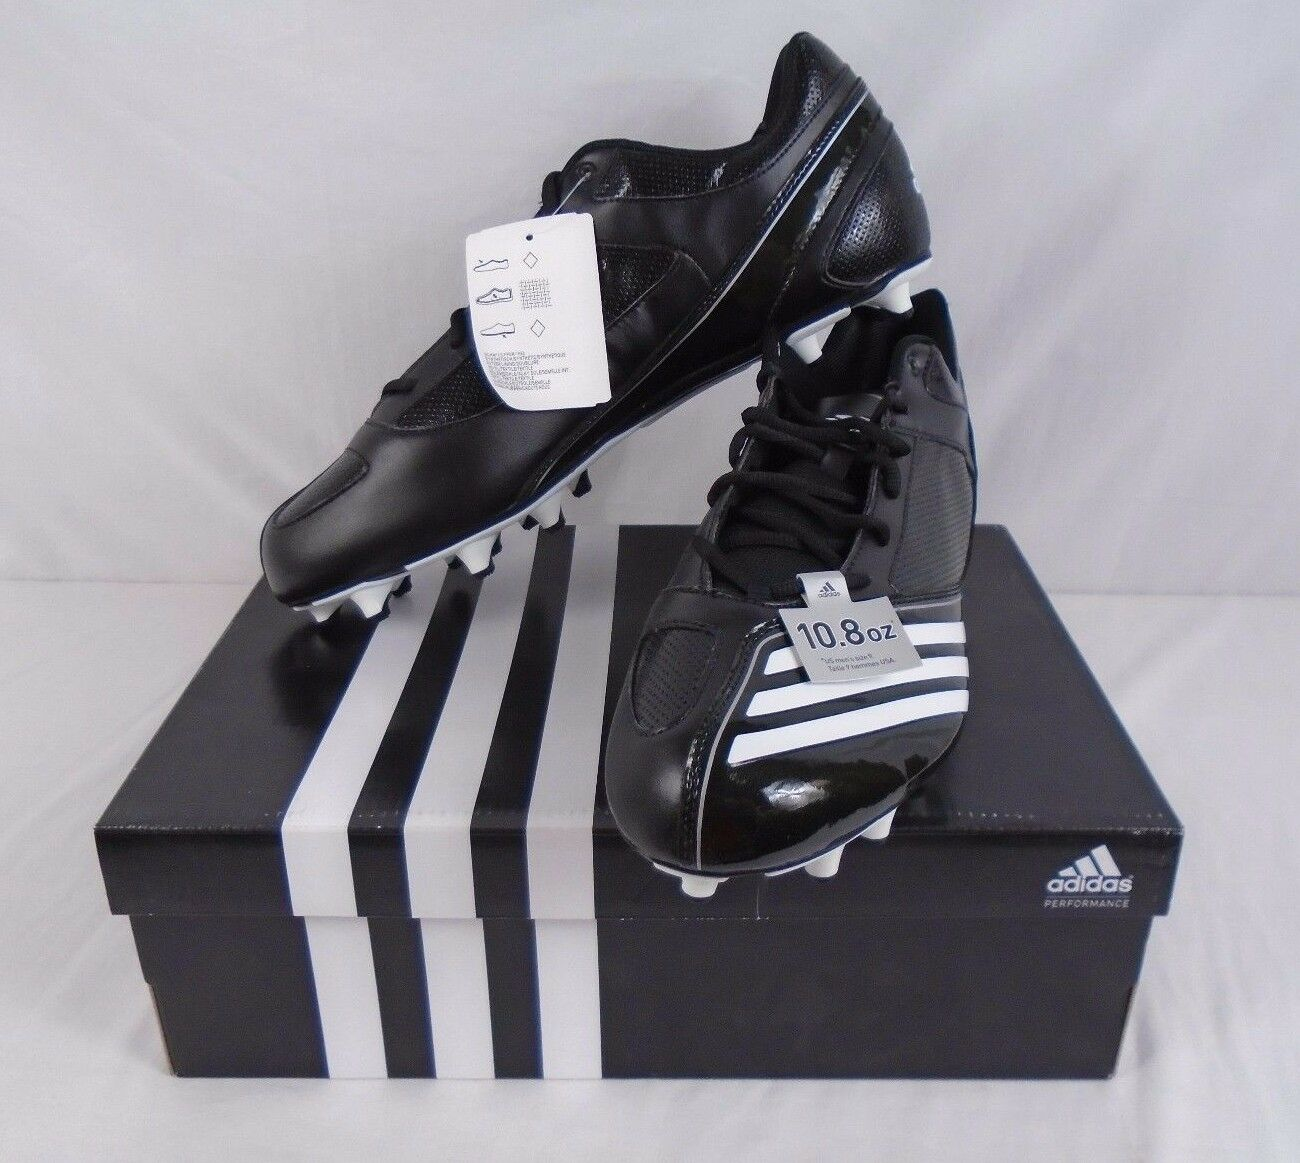 Adidas Scorch Lightning Lightning Scorch fi hombres zapatos de fútbol SZ 16 1170f baratos zapatos de mujer zapatos de mujer 24c59b